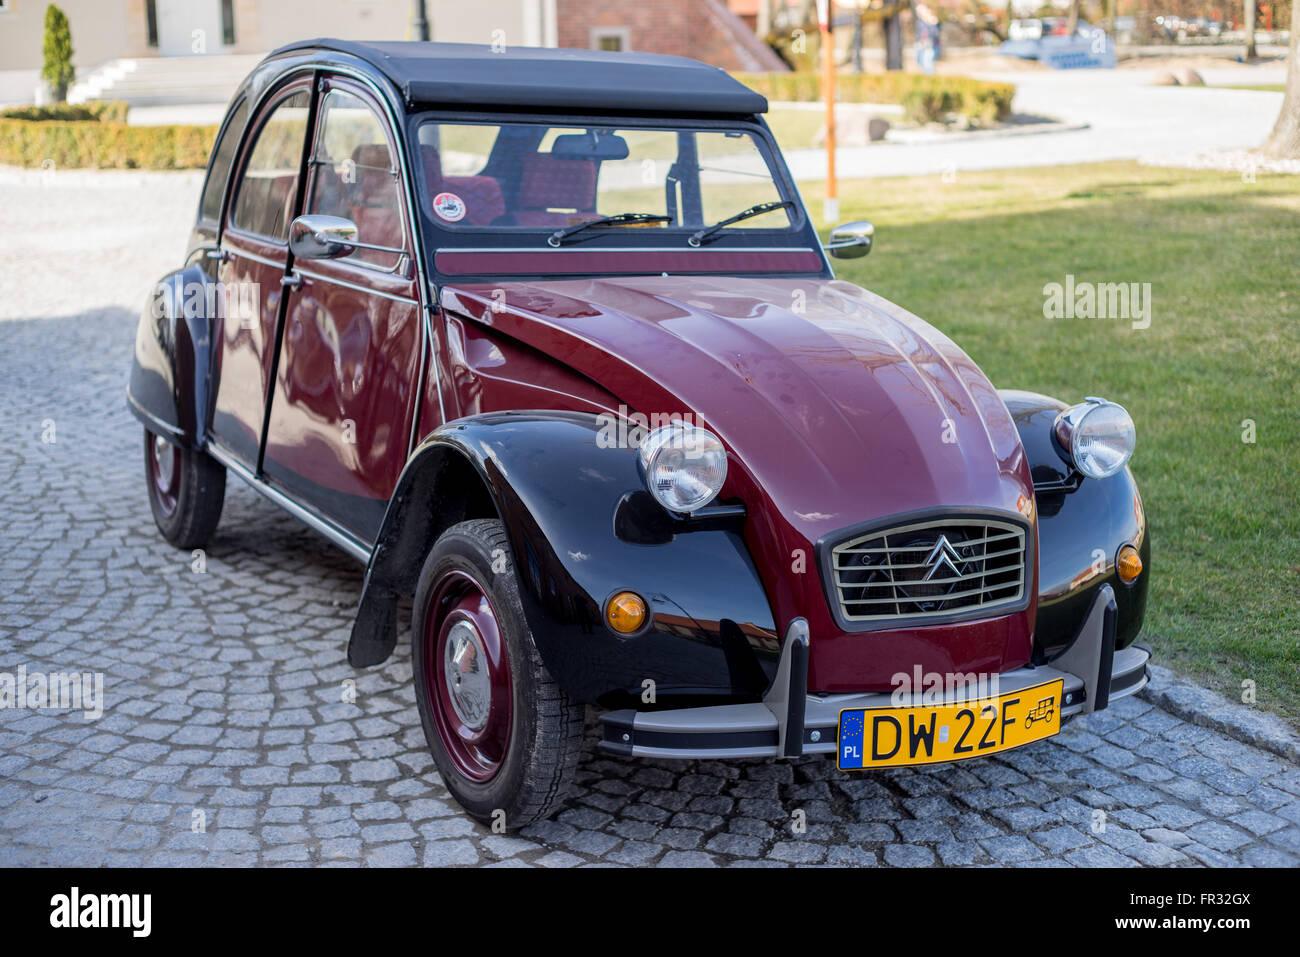 Citroën 2 CV vintage car Photo Stock